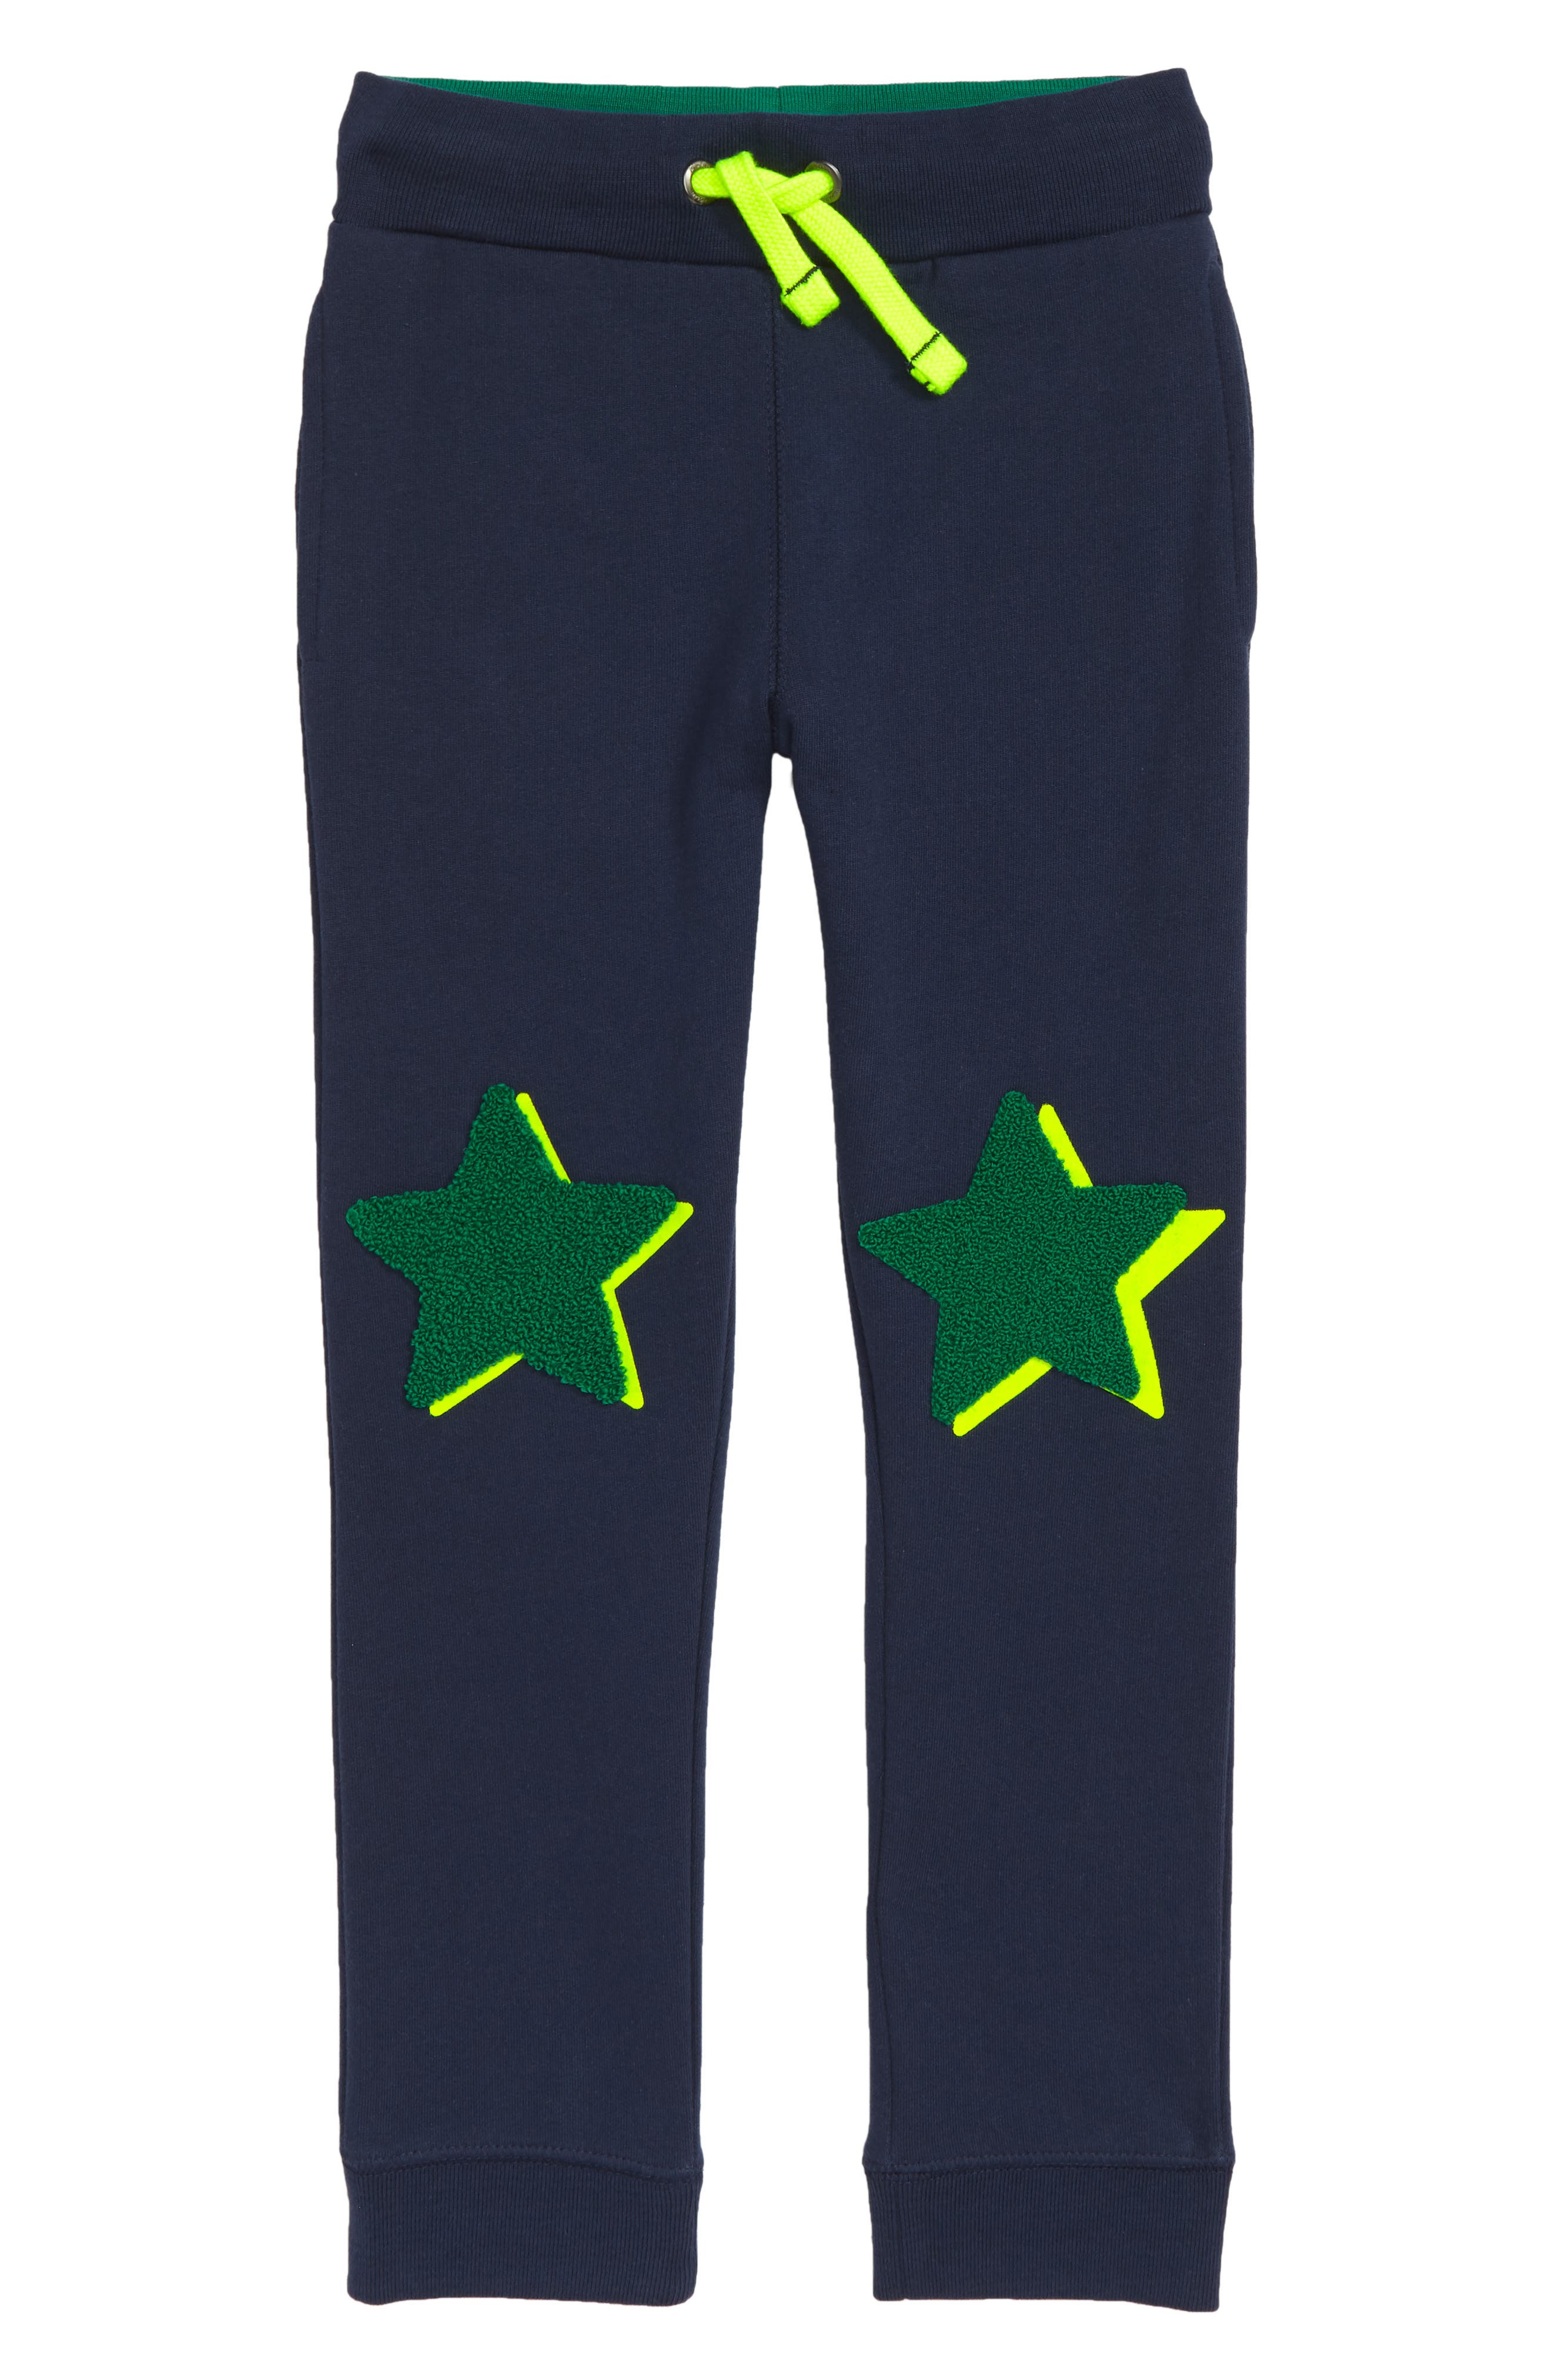 Appliqué Jogger Pants,                             Main thumbnail 1, color,                             SCHOOL NAVY